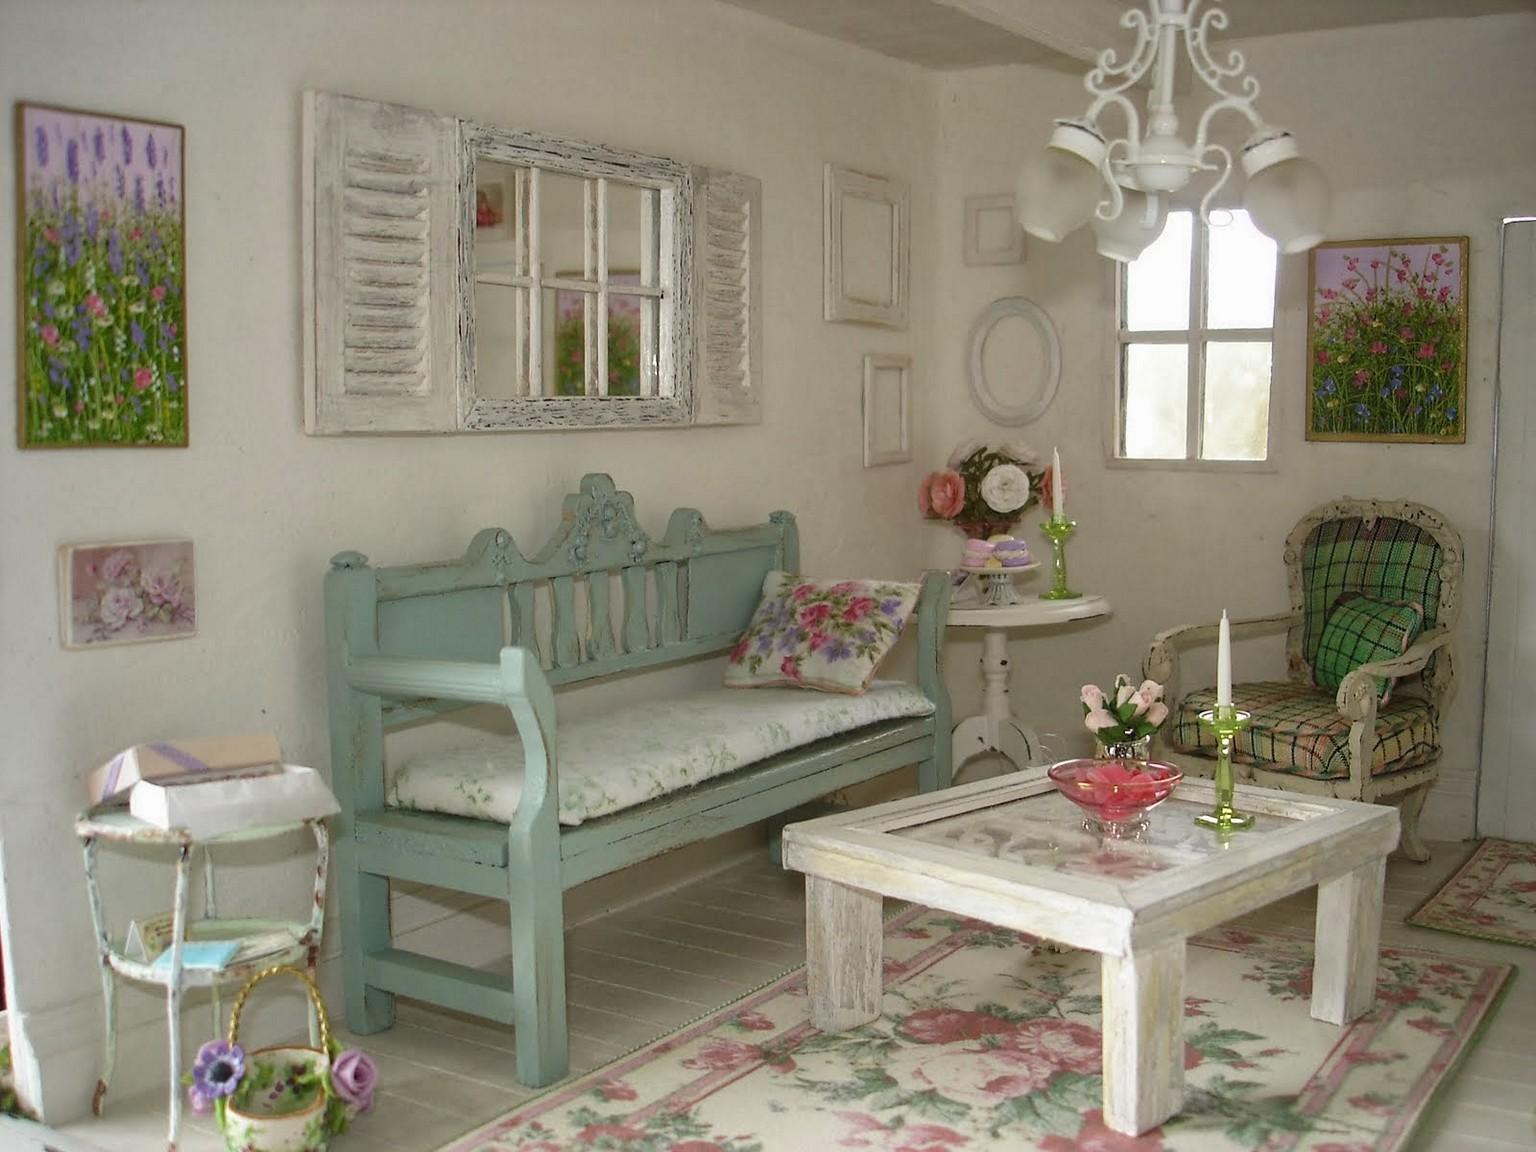 Verandainspirerat shabby chic vardagsrum.  Källa: backtobasicliving.com